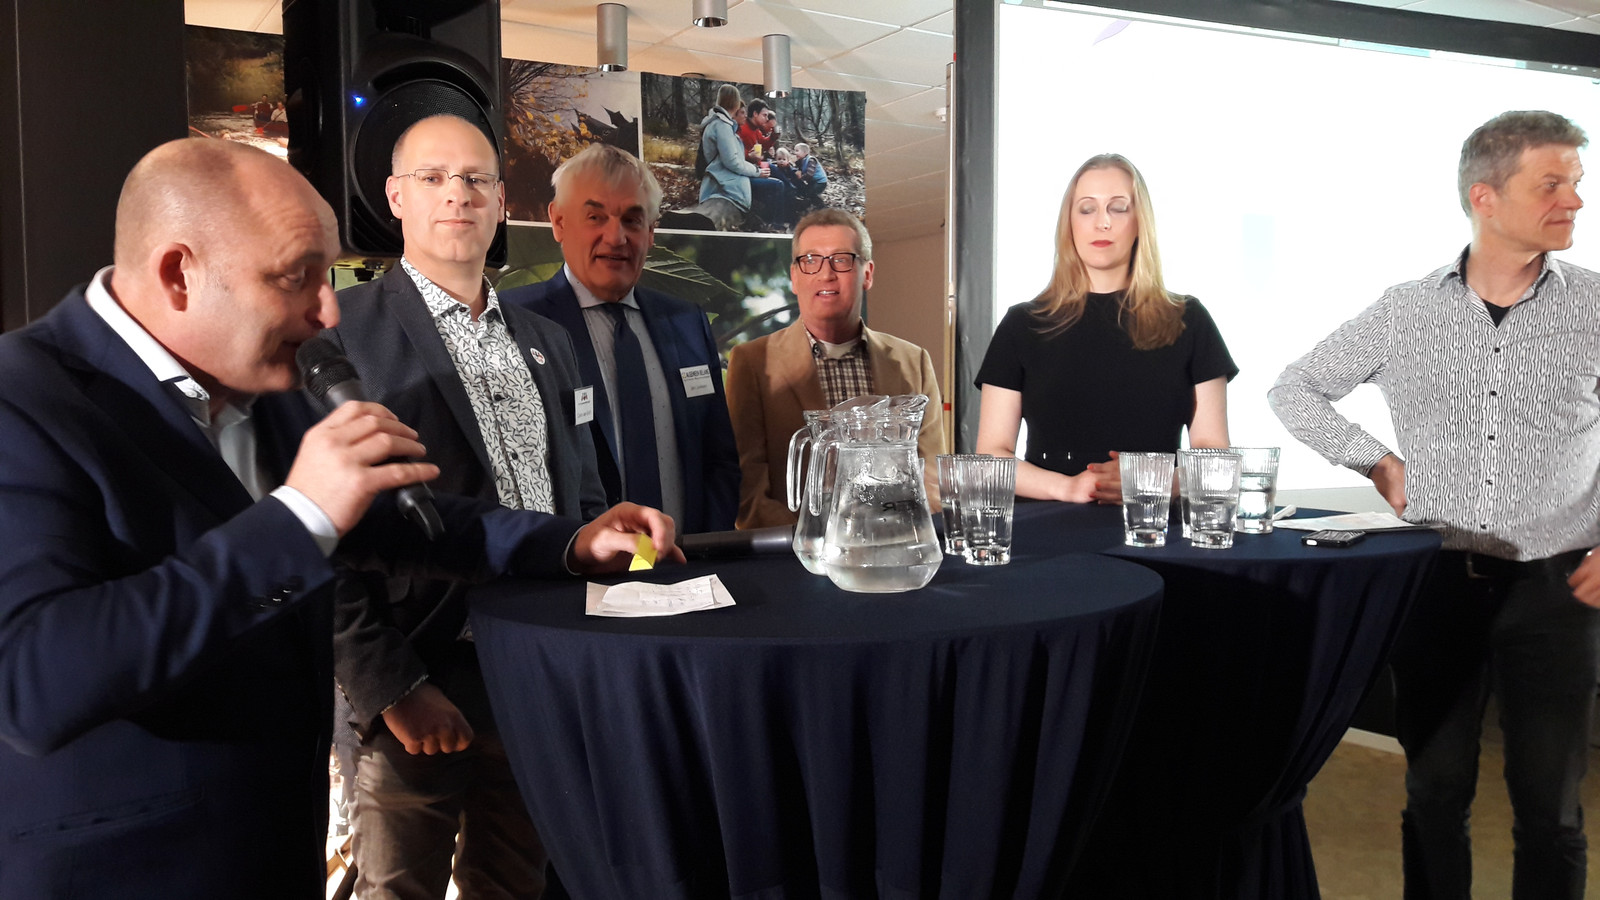 Carlo van Esch (links) luistert naar Lovo-presentator Rens Merkelbach. Overige lijsttrekkers (vlnr): Jan Jonkers (AB), Jan de Laat (PrO), Anne Cristien Spekle (VVD) en Guus Mulders (CDA).